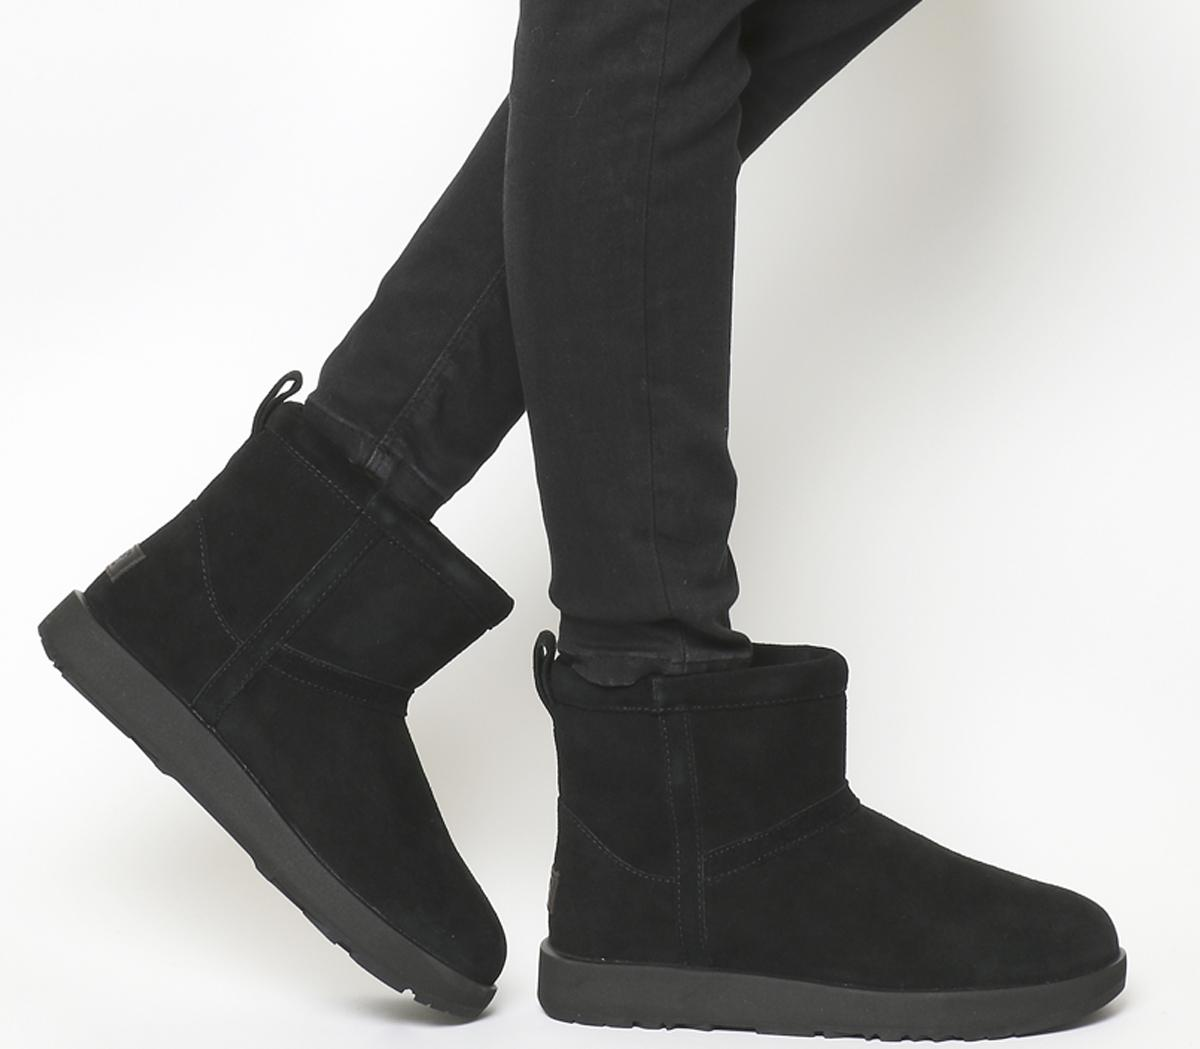 Classic Boots Black UGG Classic Mini Leather Waterproof Womens Black — HMG Properties